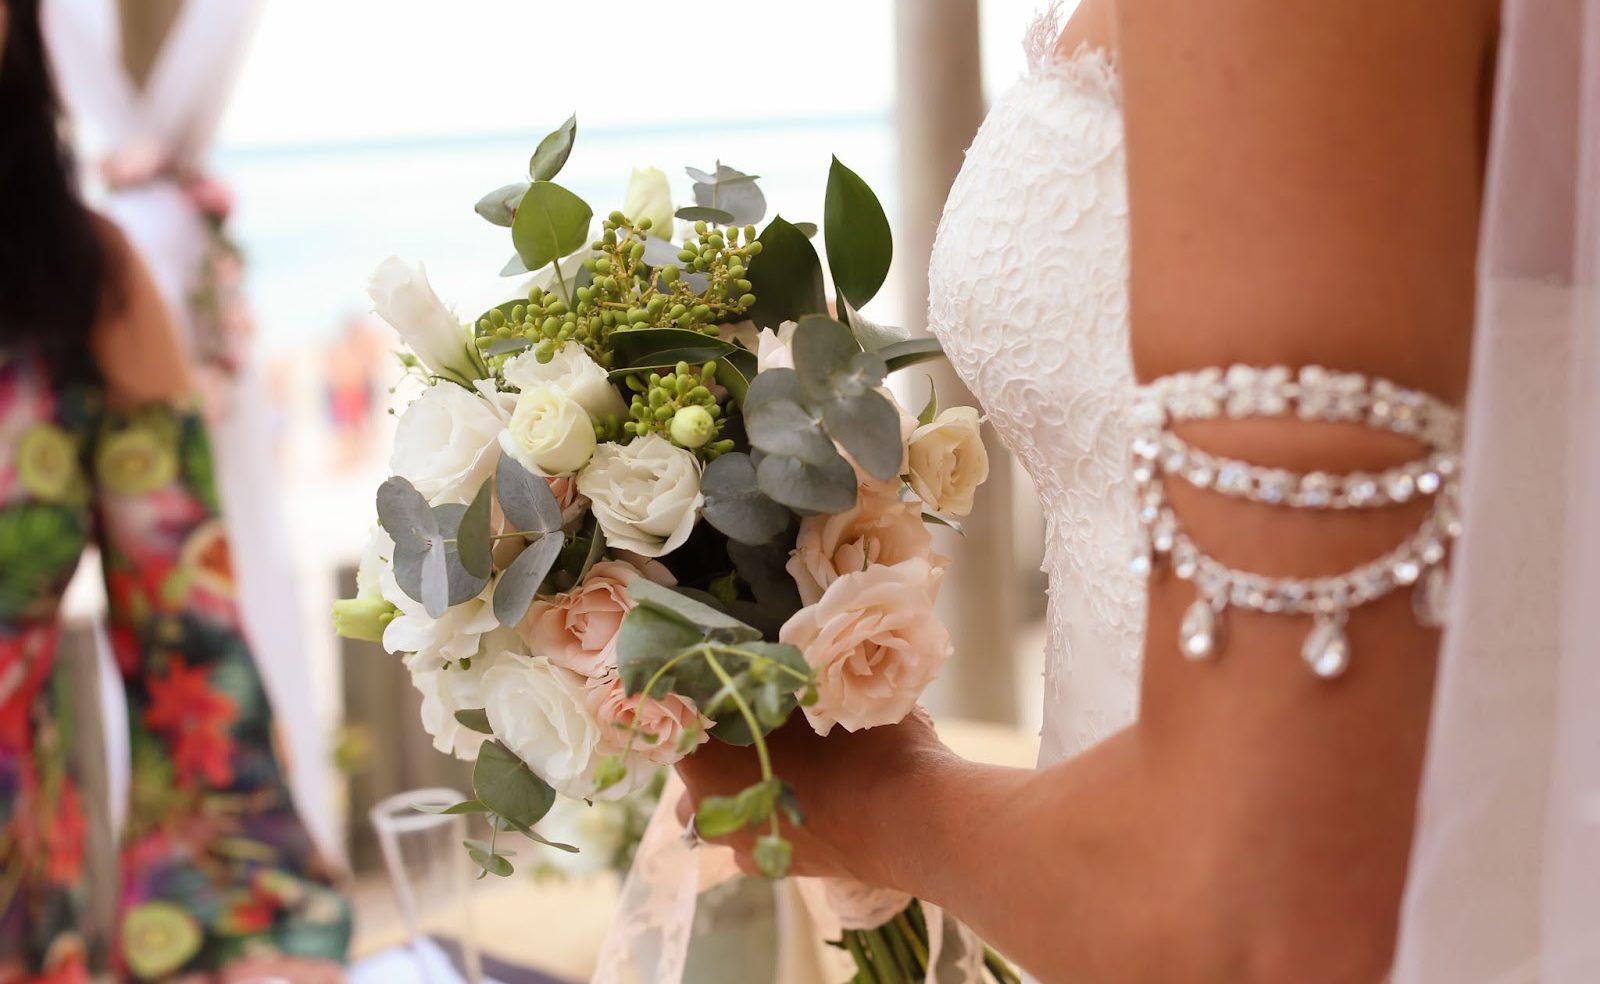 Buque de noiva branco e rosa